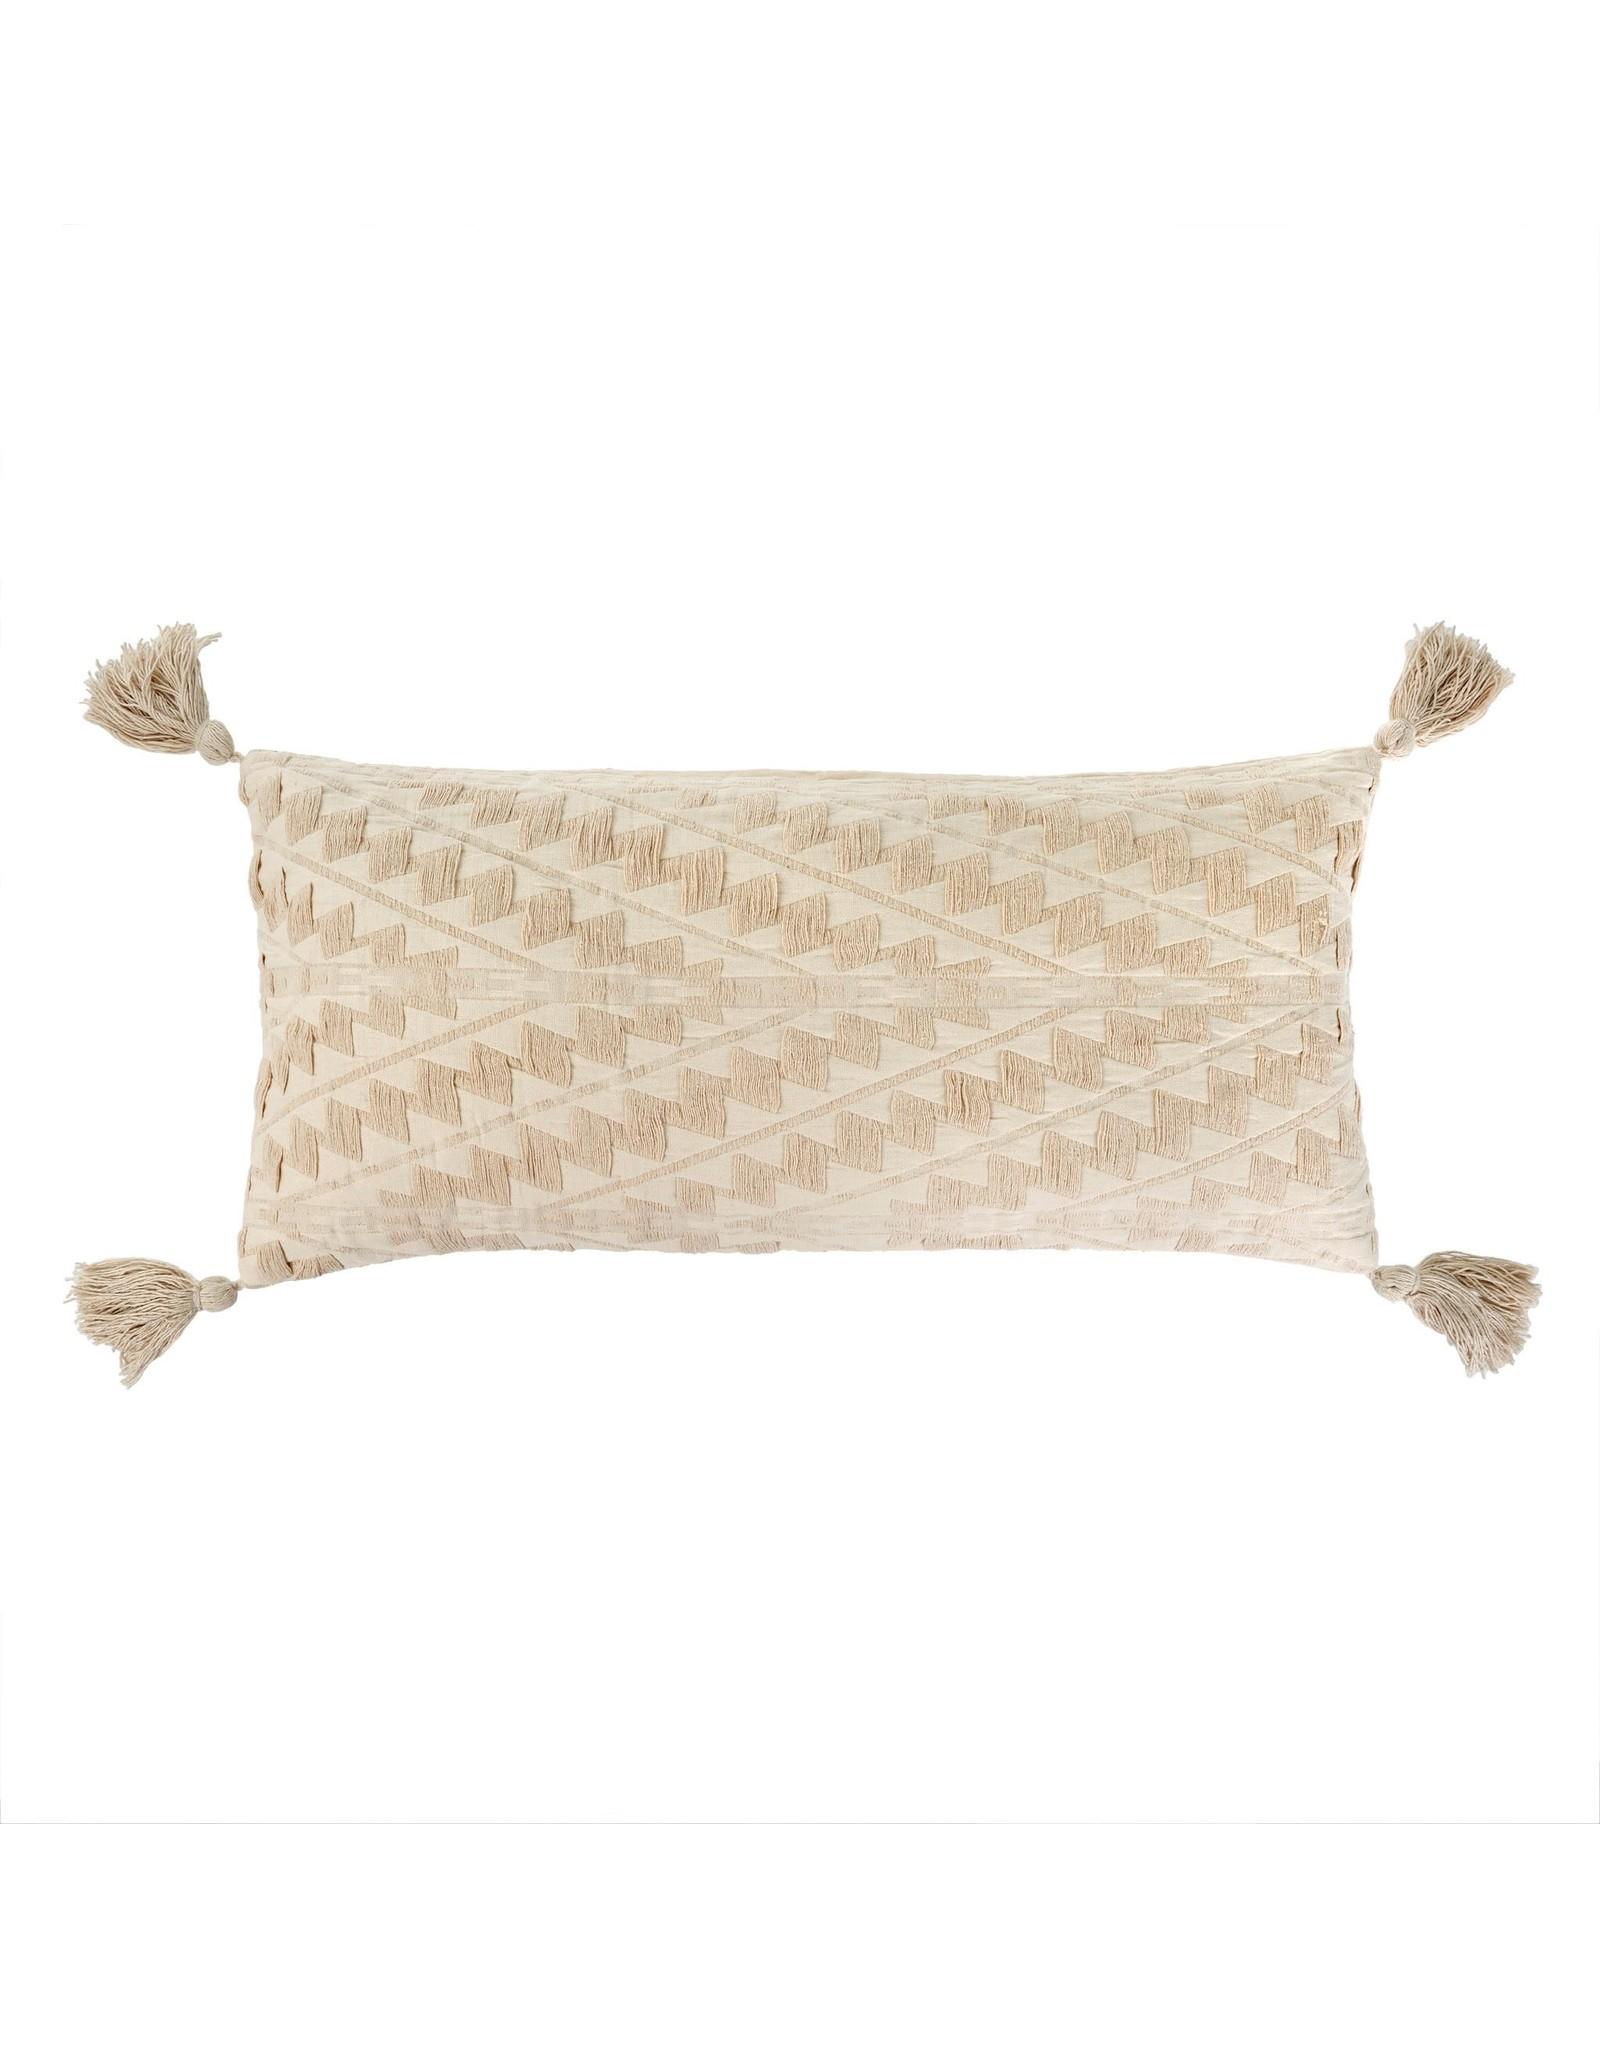 15x32 Athens Bolster Pillow, Ecru